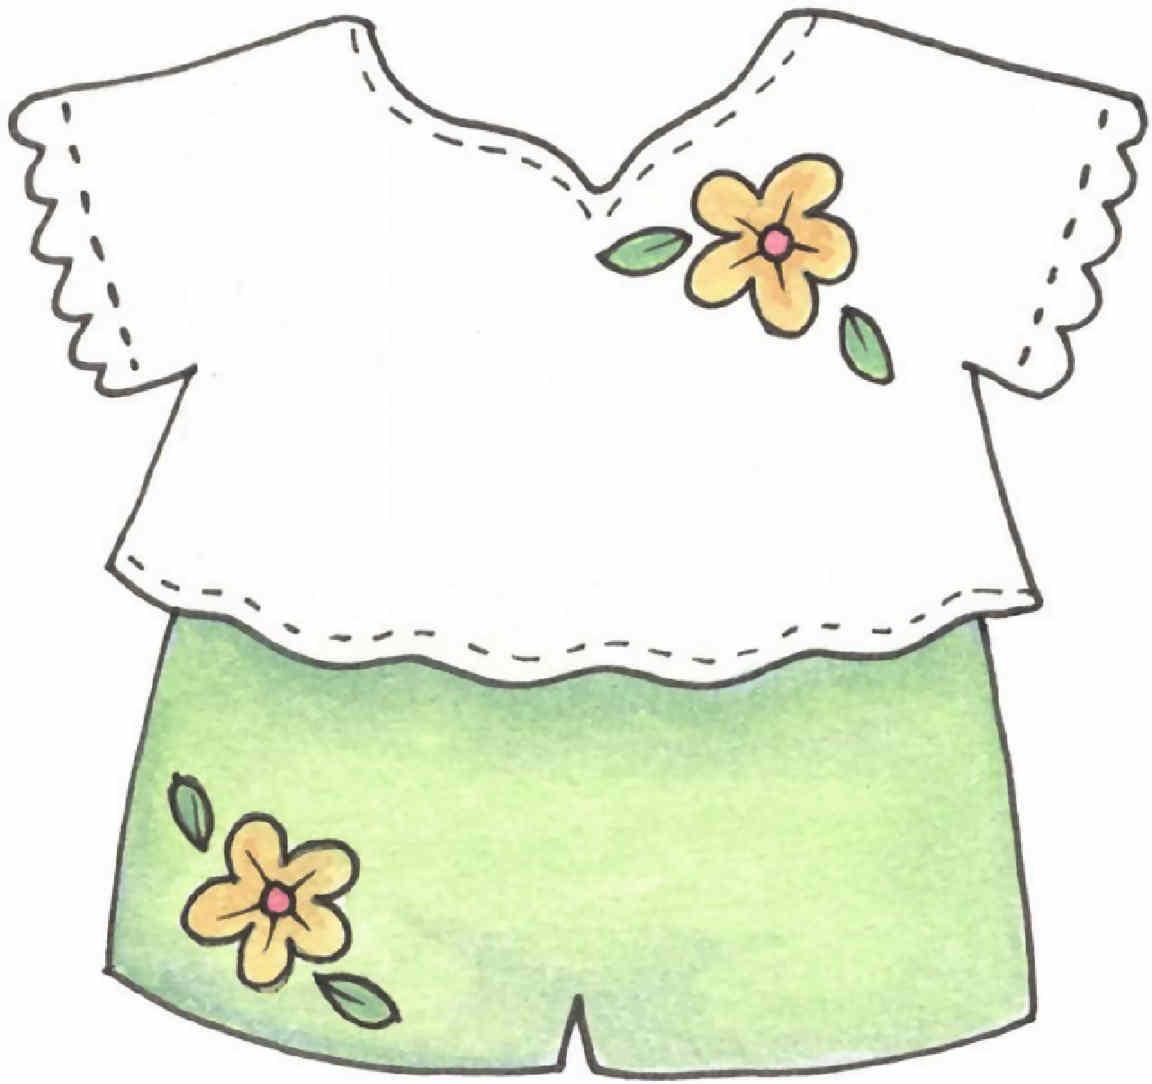 Dibujos ropa de beb ni o imagui - Dibujos infantiles de bebes ...